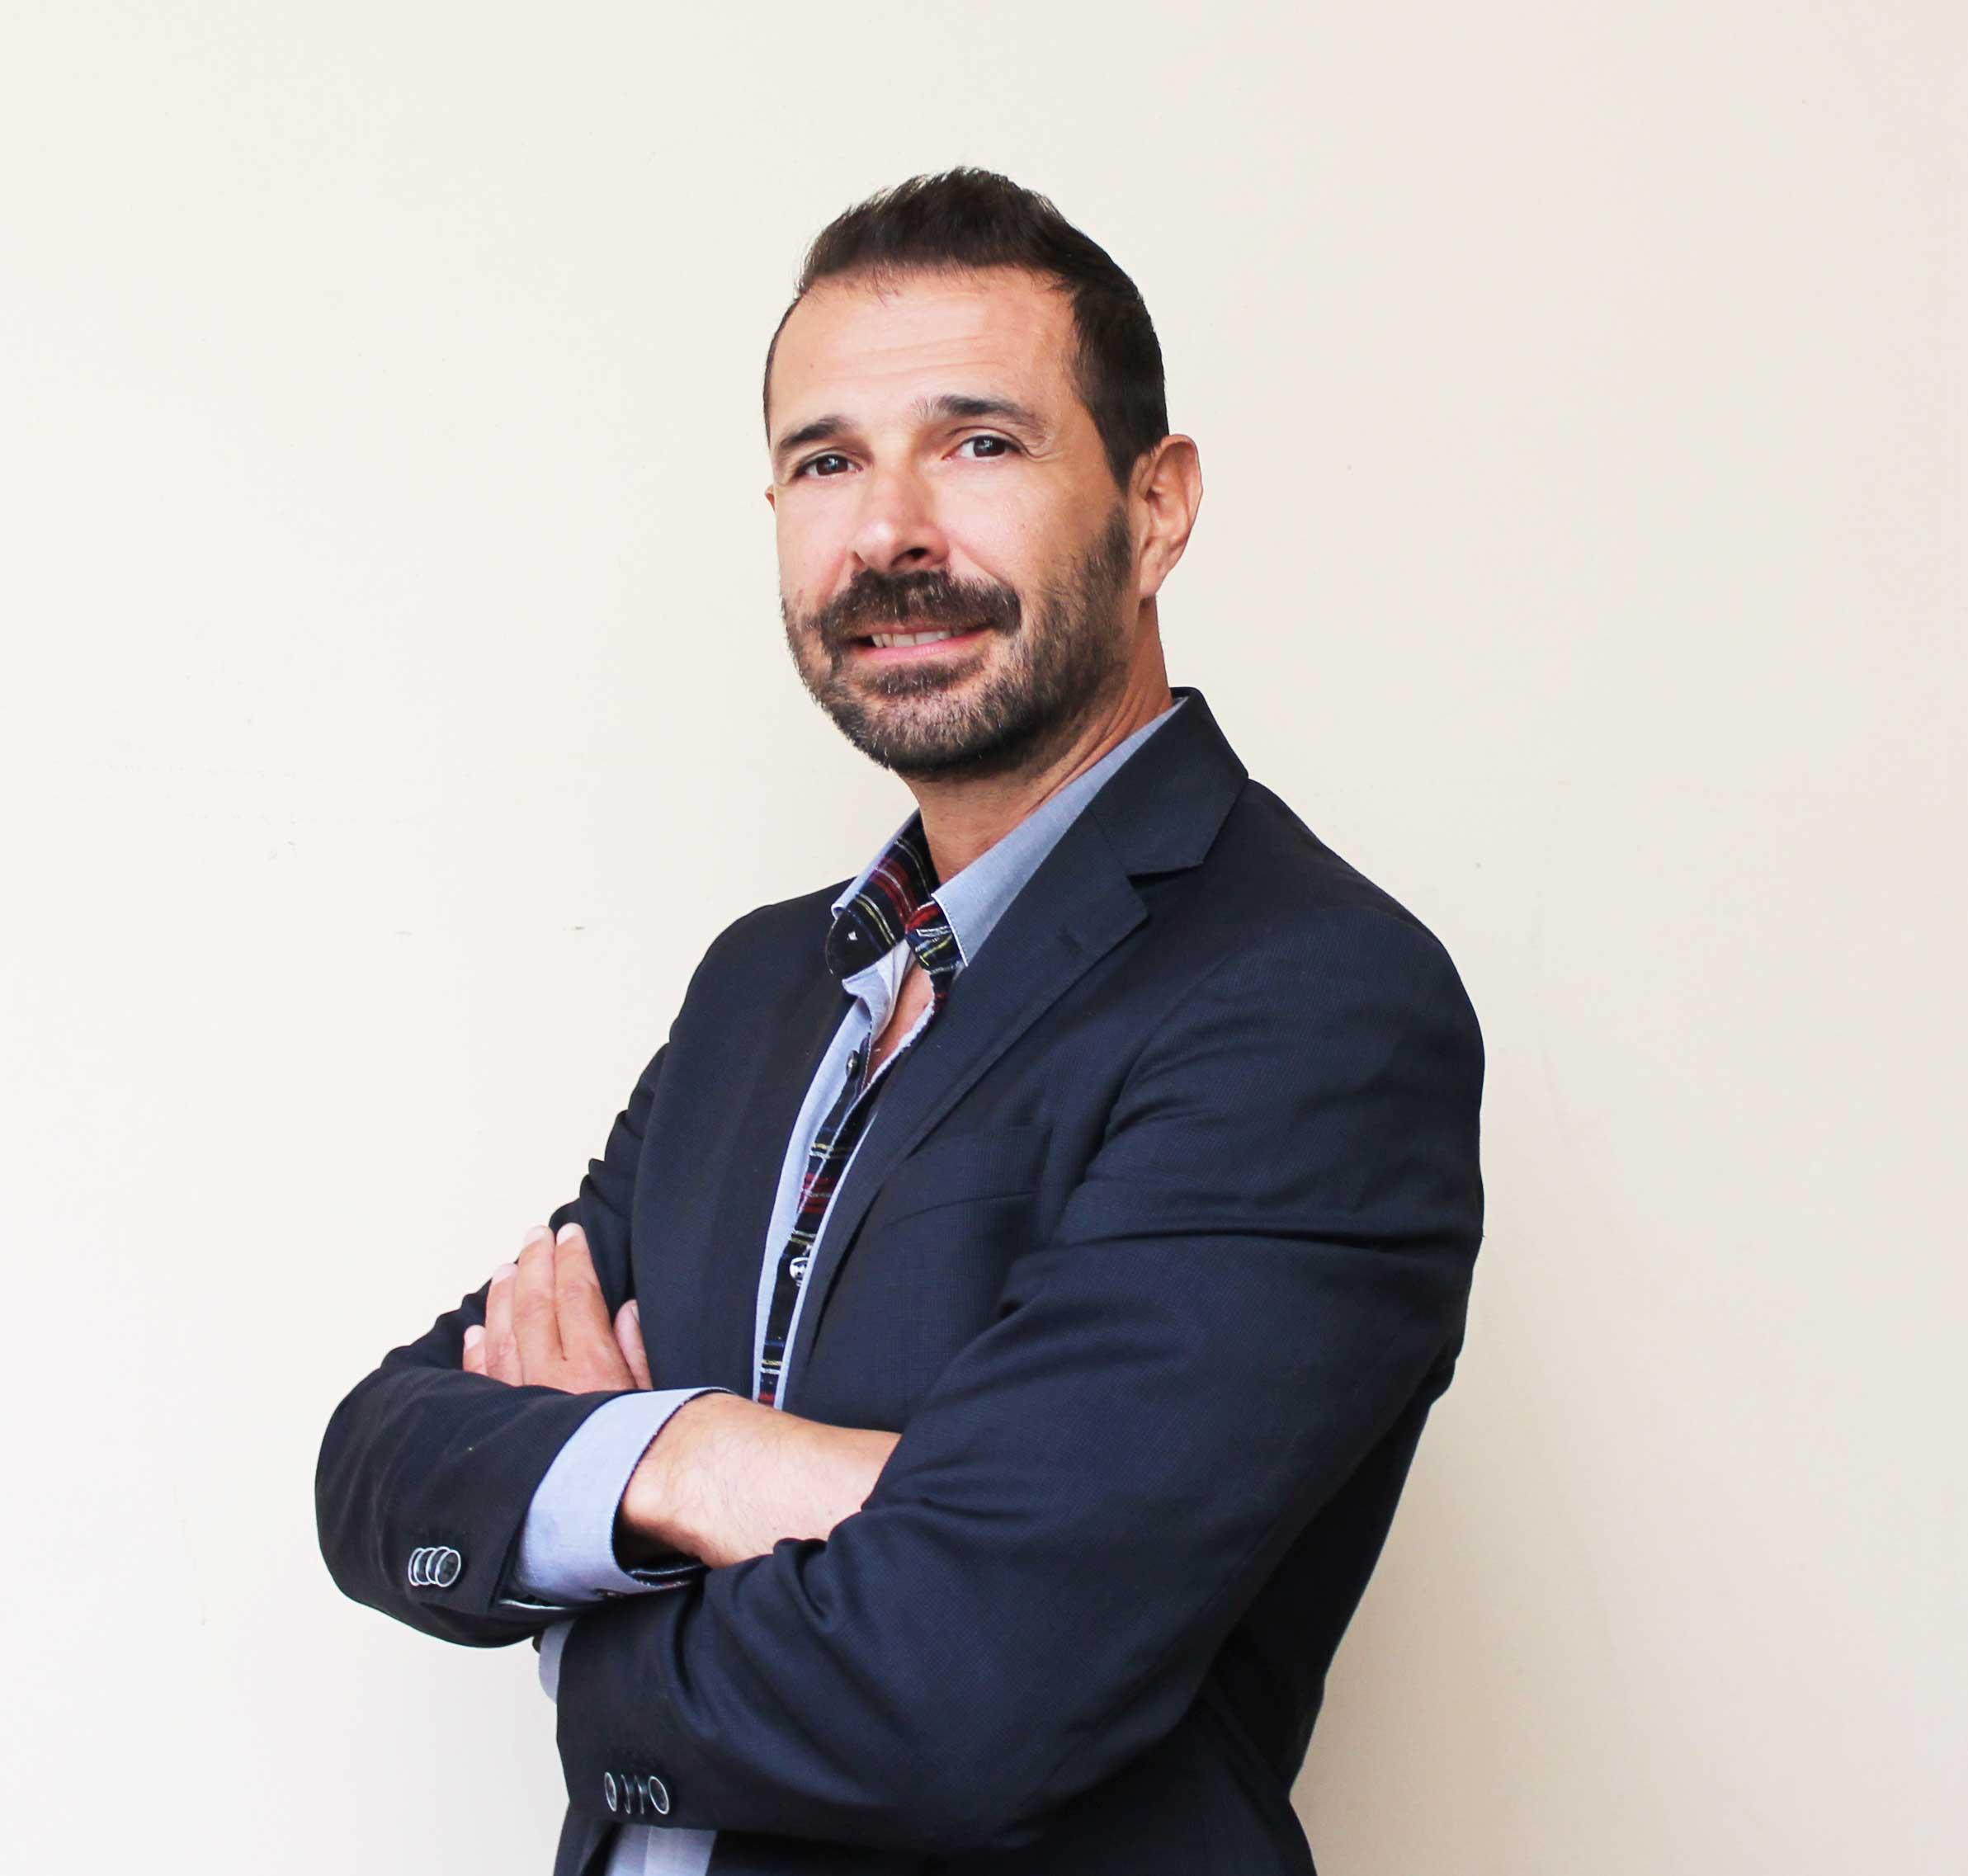 Claudio Bentivogli